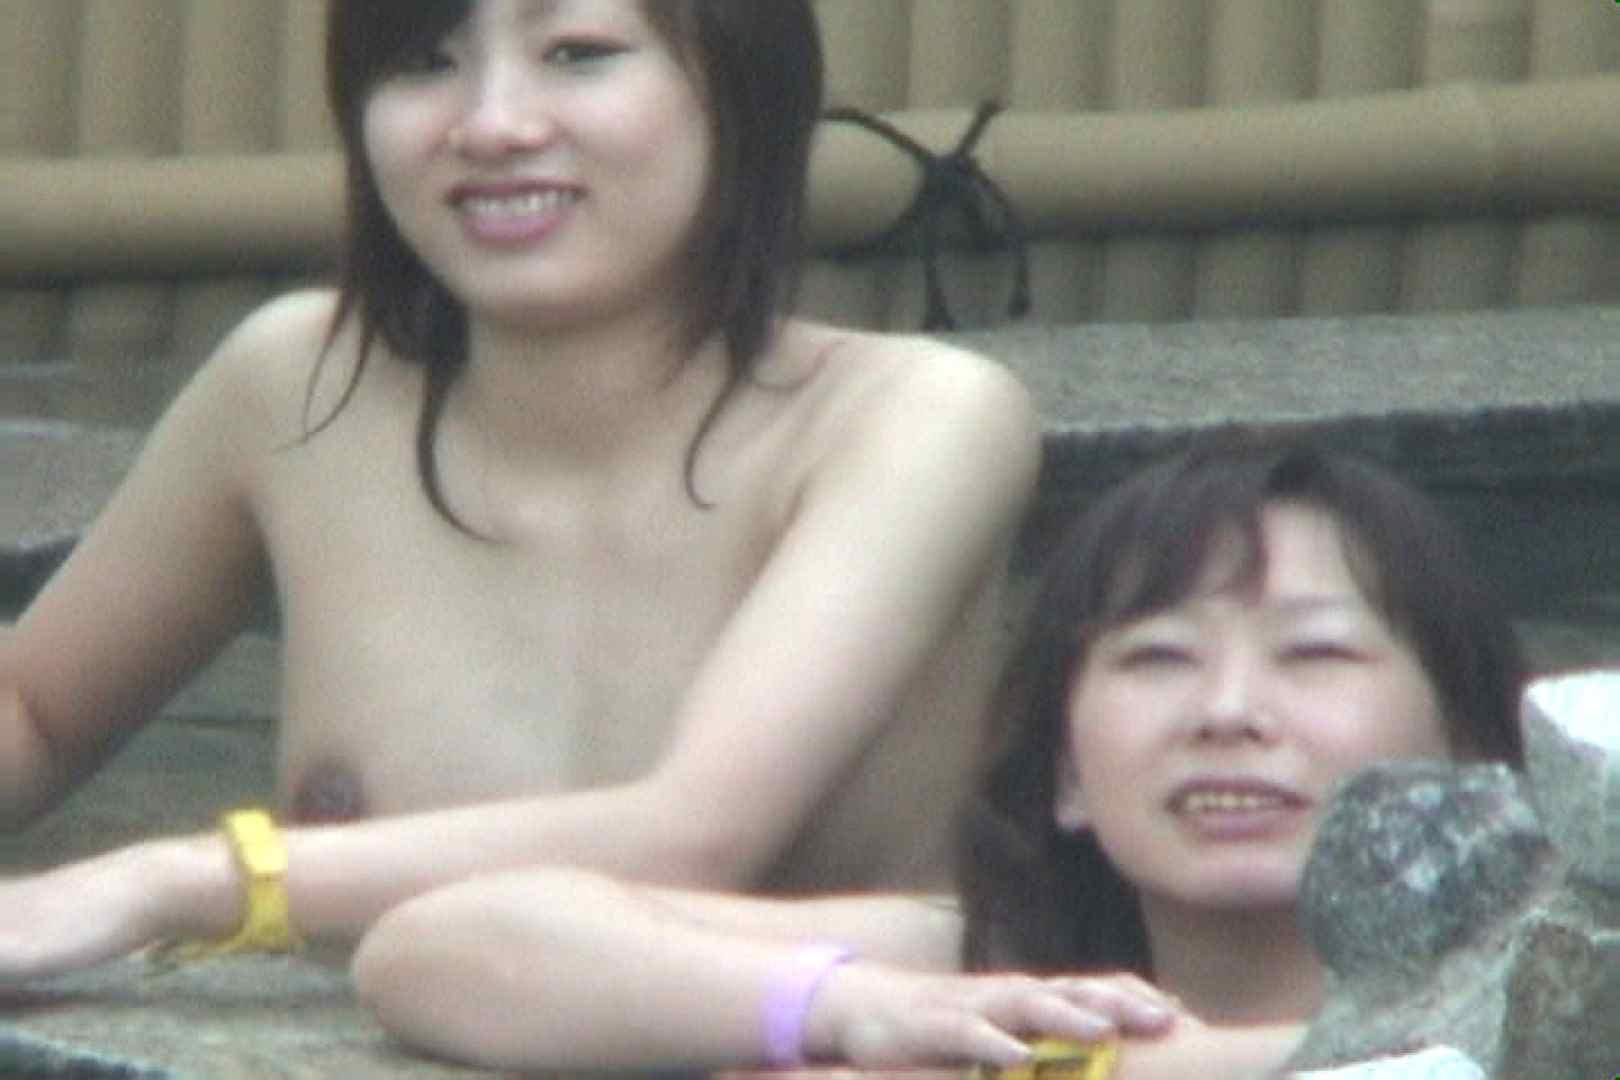 Aquaな露天風呂Vol.58【VIP限定】 盗撮   OLセックス  89画像 73